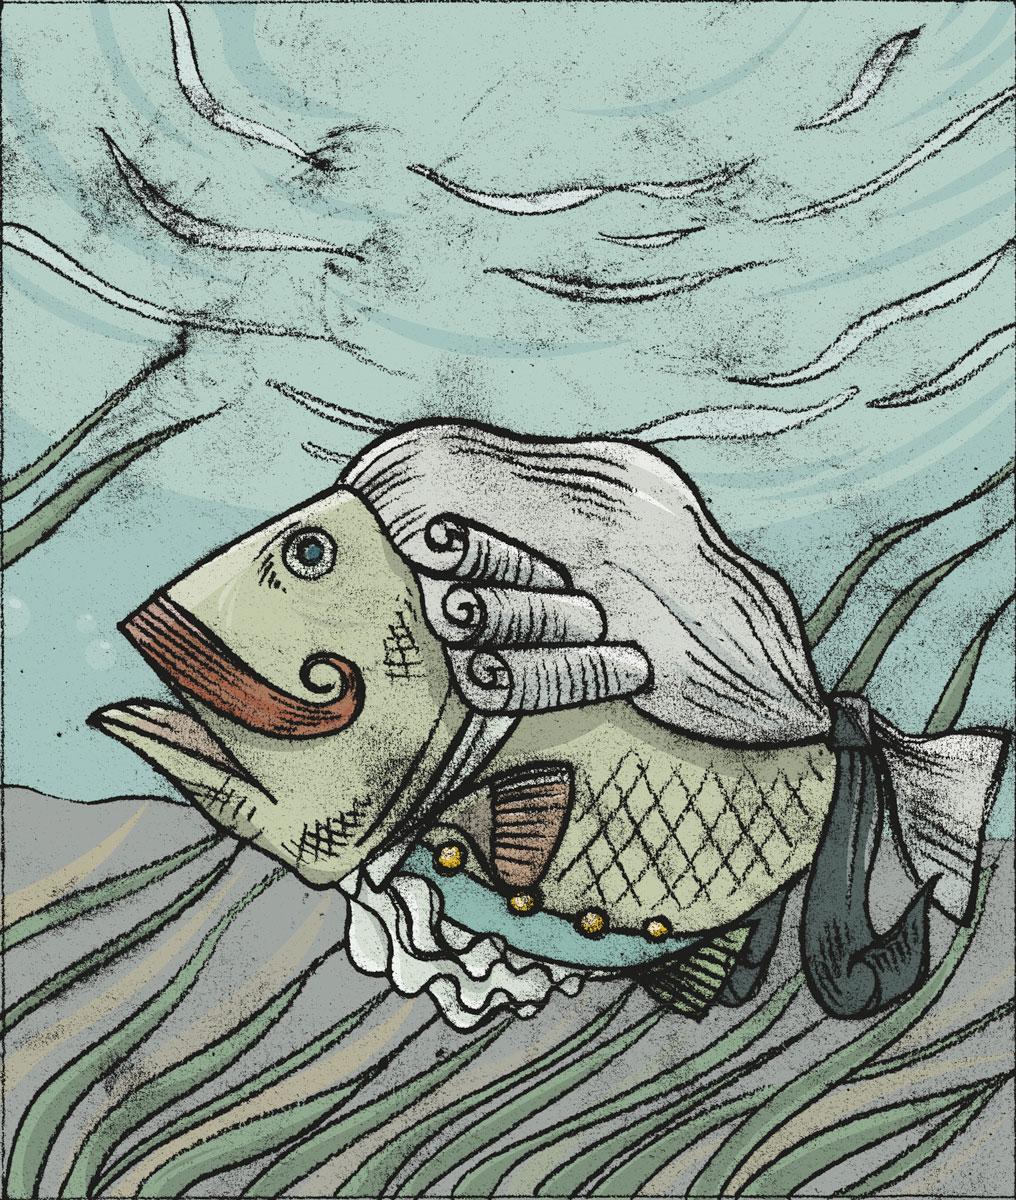 Very-important-fish-2.jpg